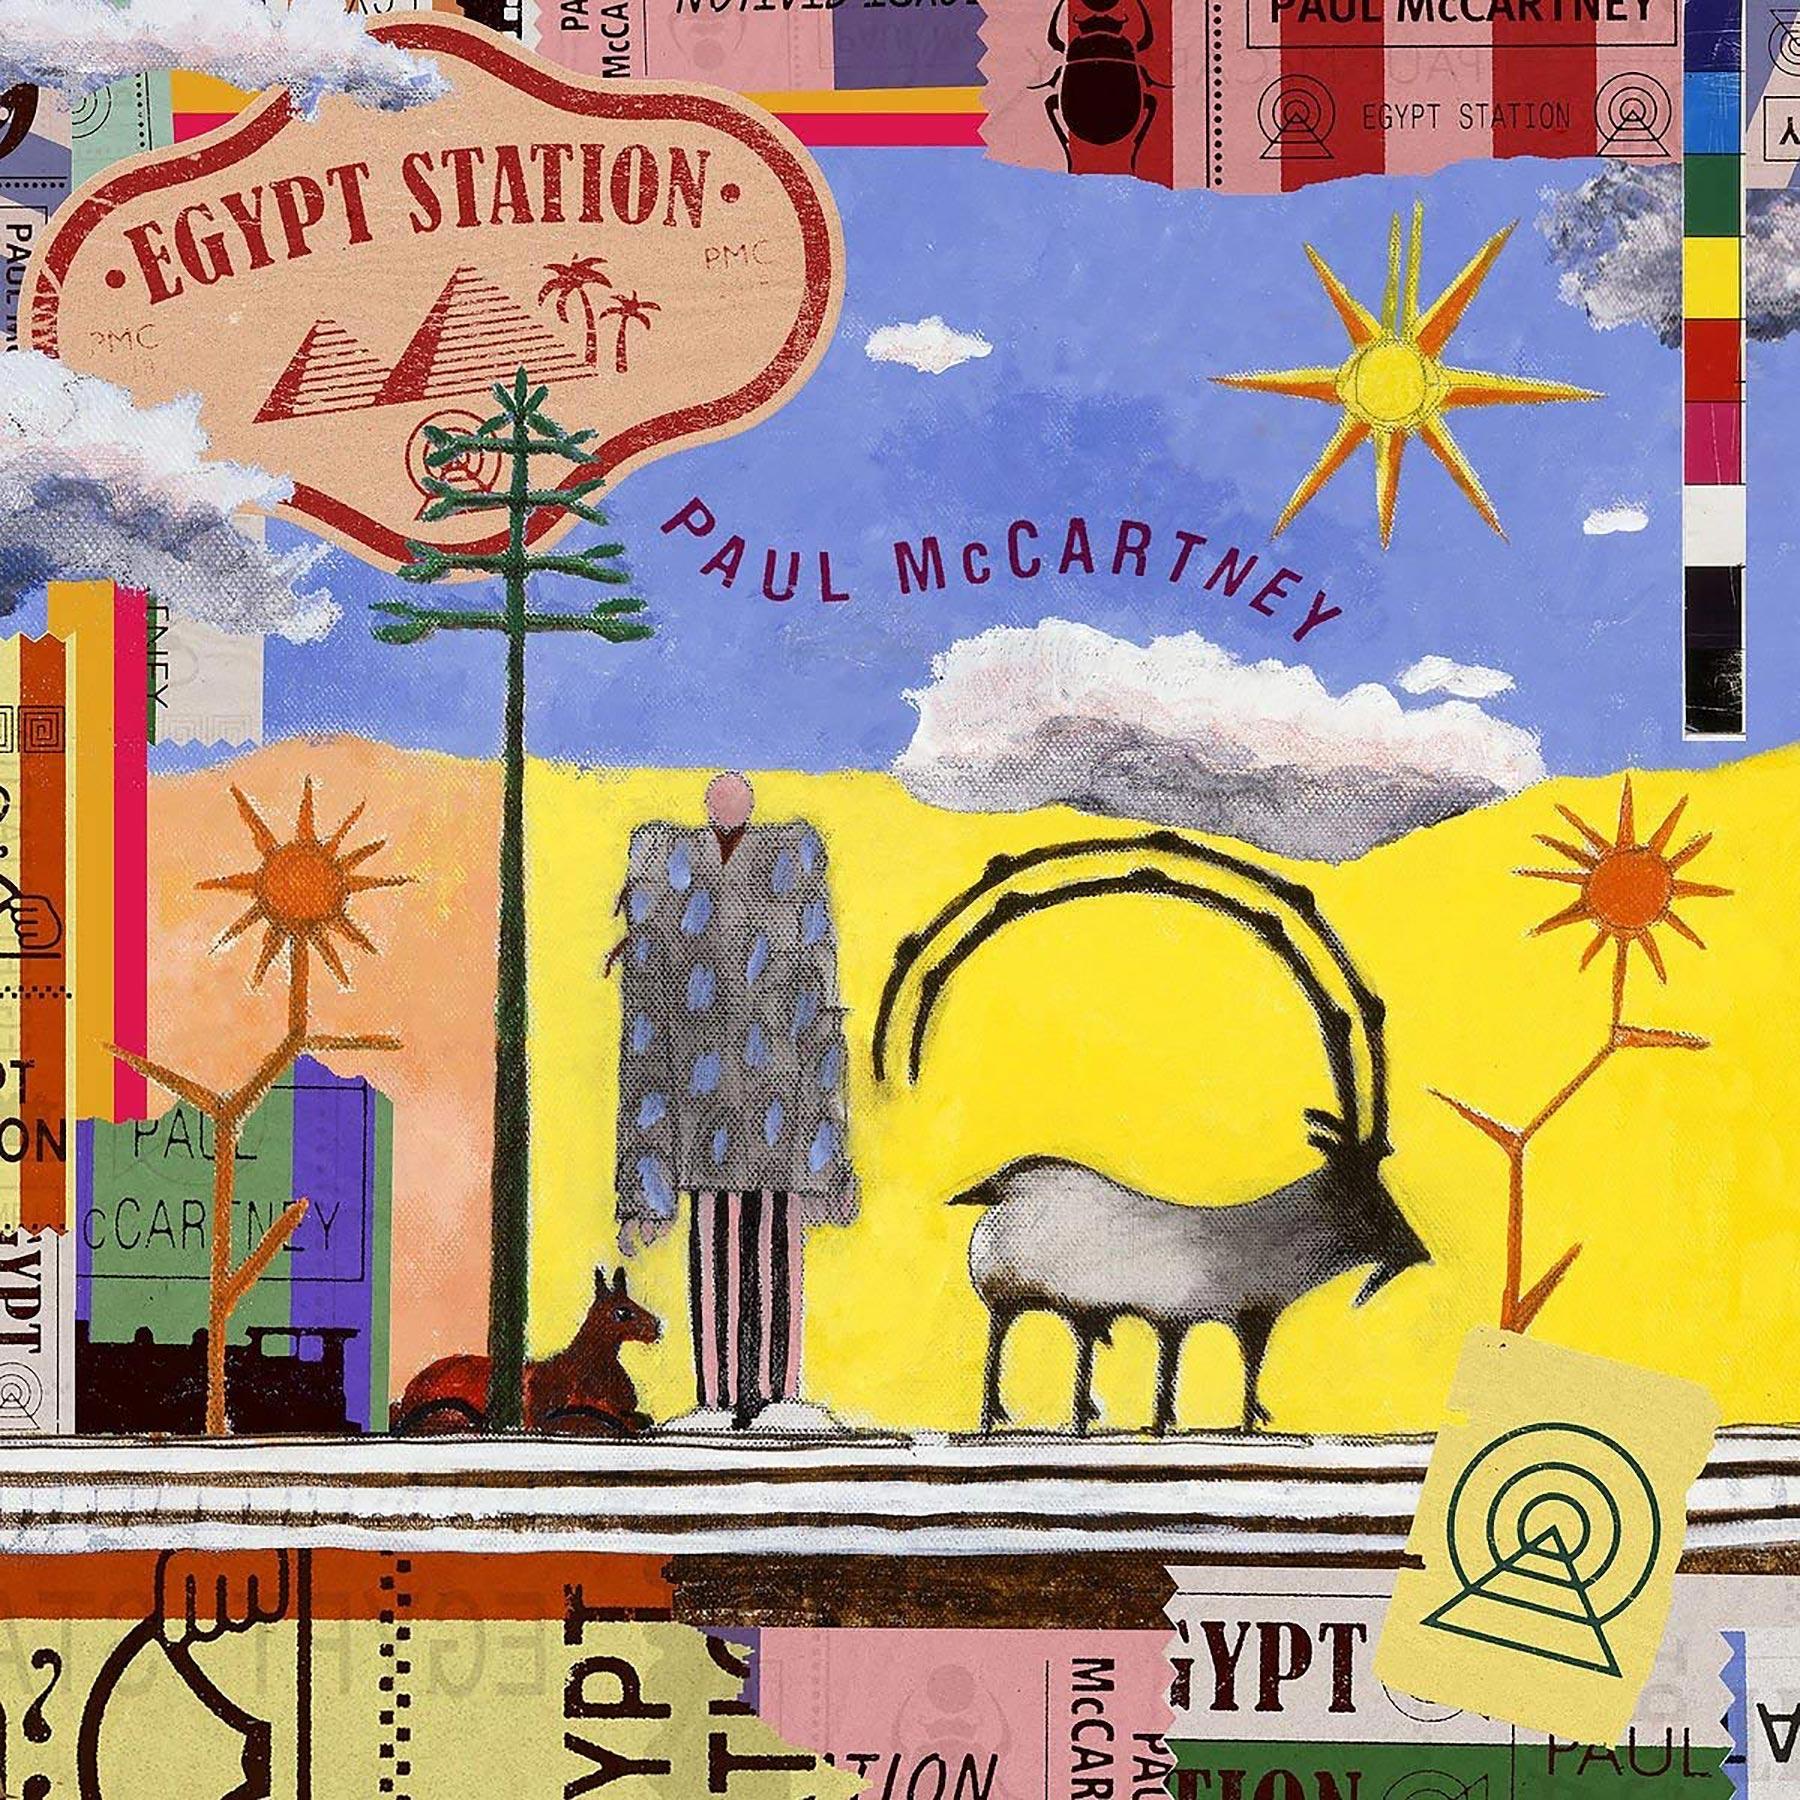 Paul McCartney, Egypt StationCR: Capitol